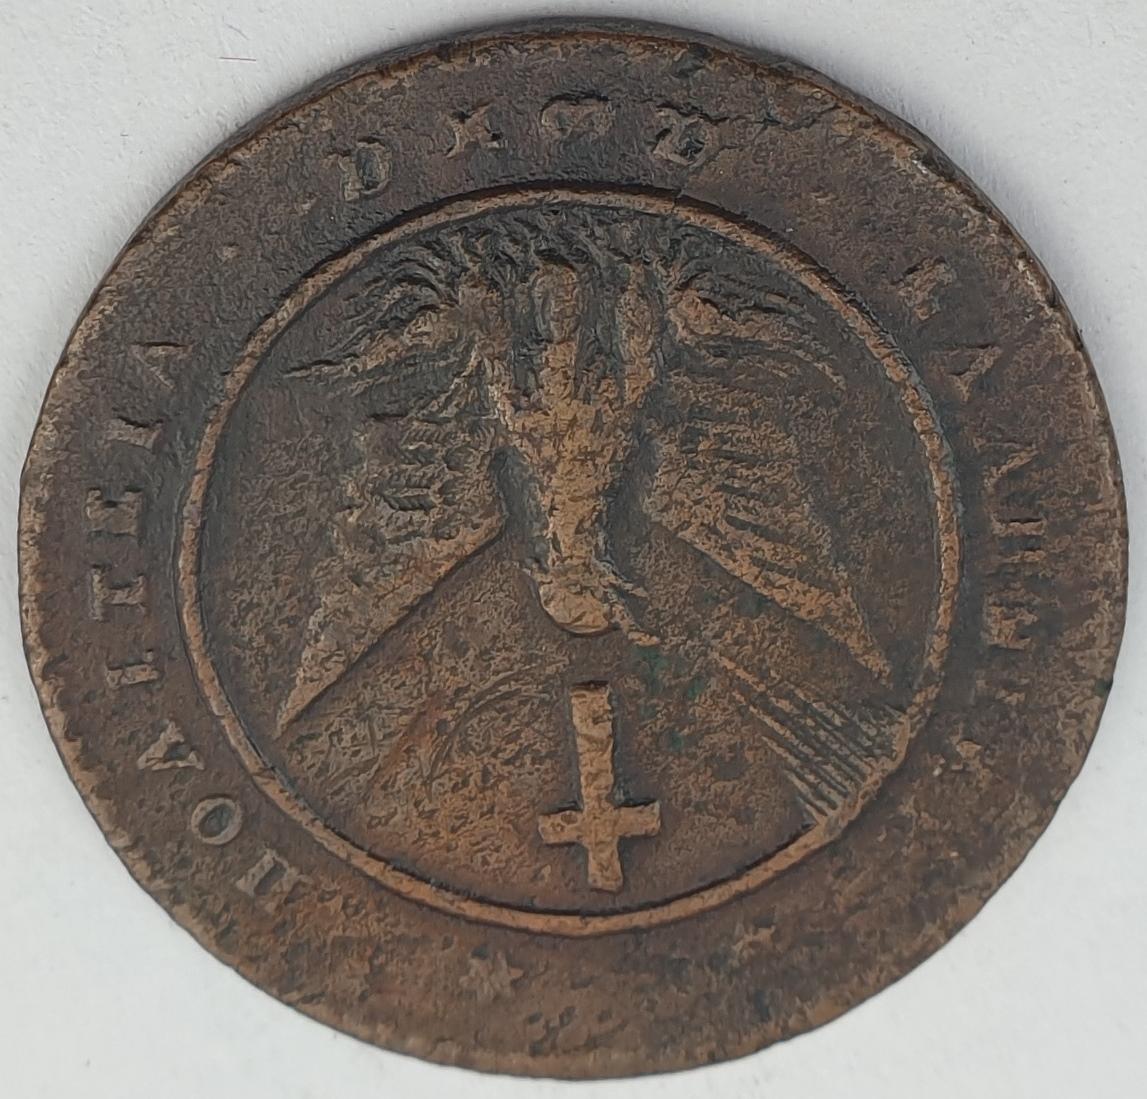 Greece - 5 Lepta 1828, Ioannis Kapodistrias